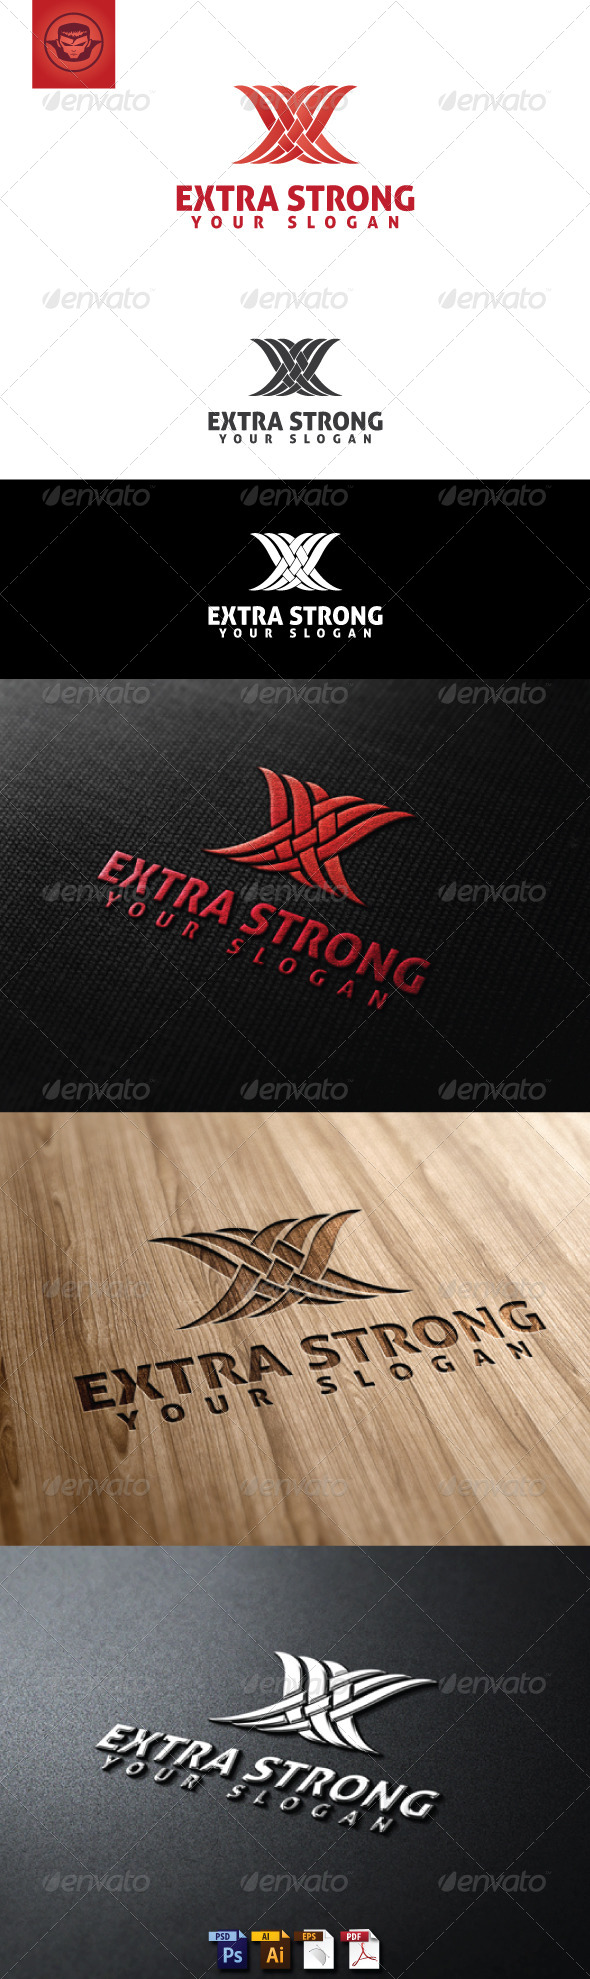 Extra Strong Logo Template